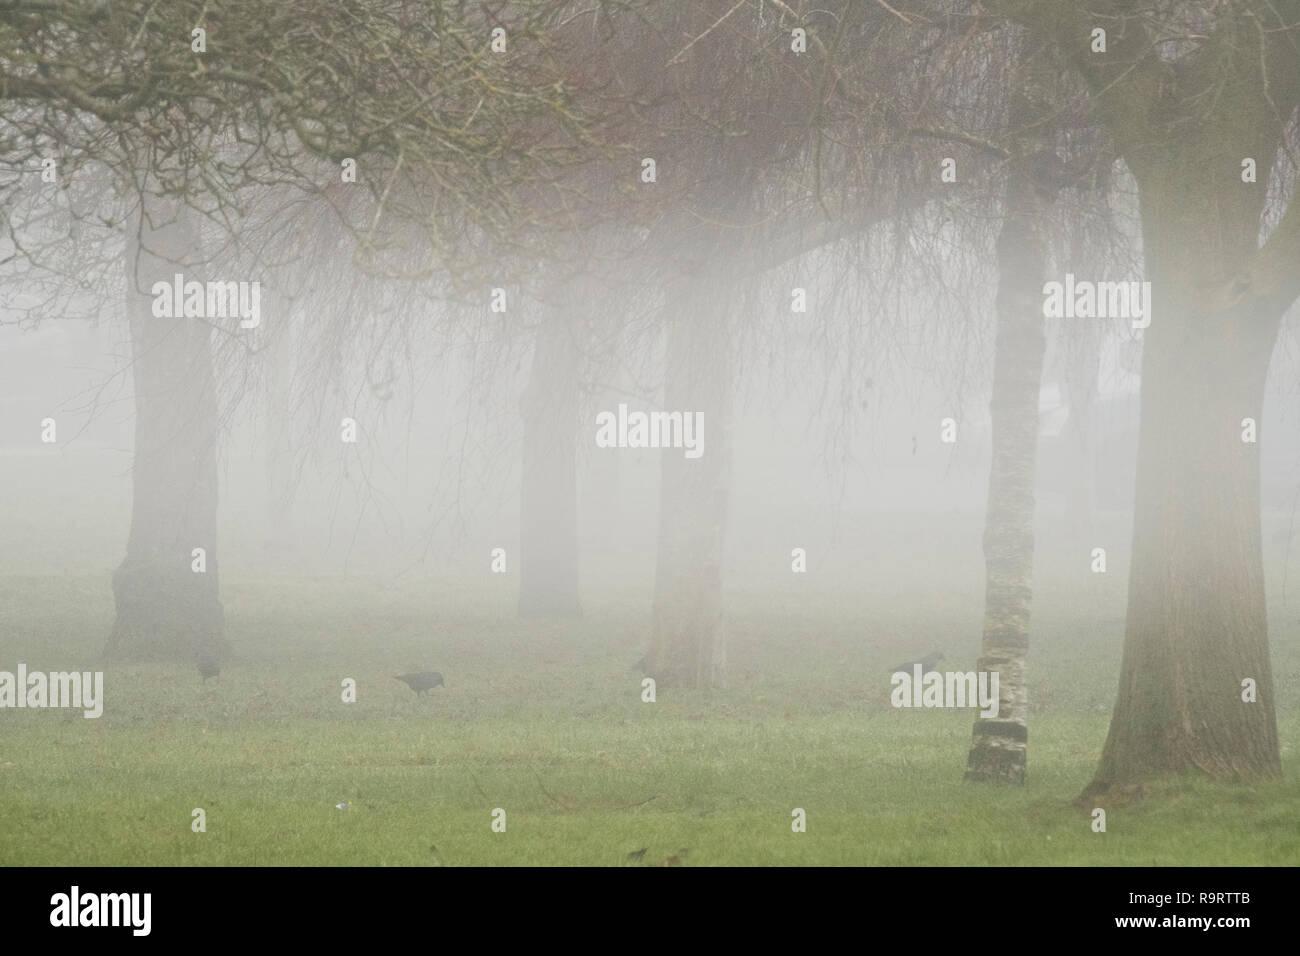 Salisbury, UK. 28th December 2018. Uk Weather. 10:25am and Salisbury still covered in fog Credit Paul Chambers/ Alamy News Stock Photo